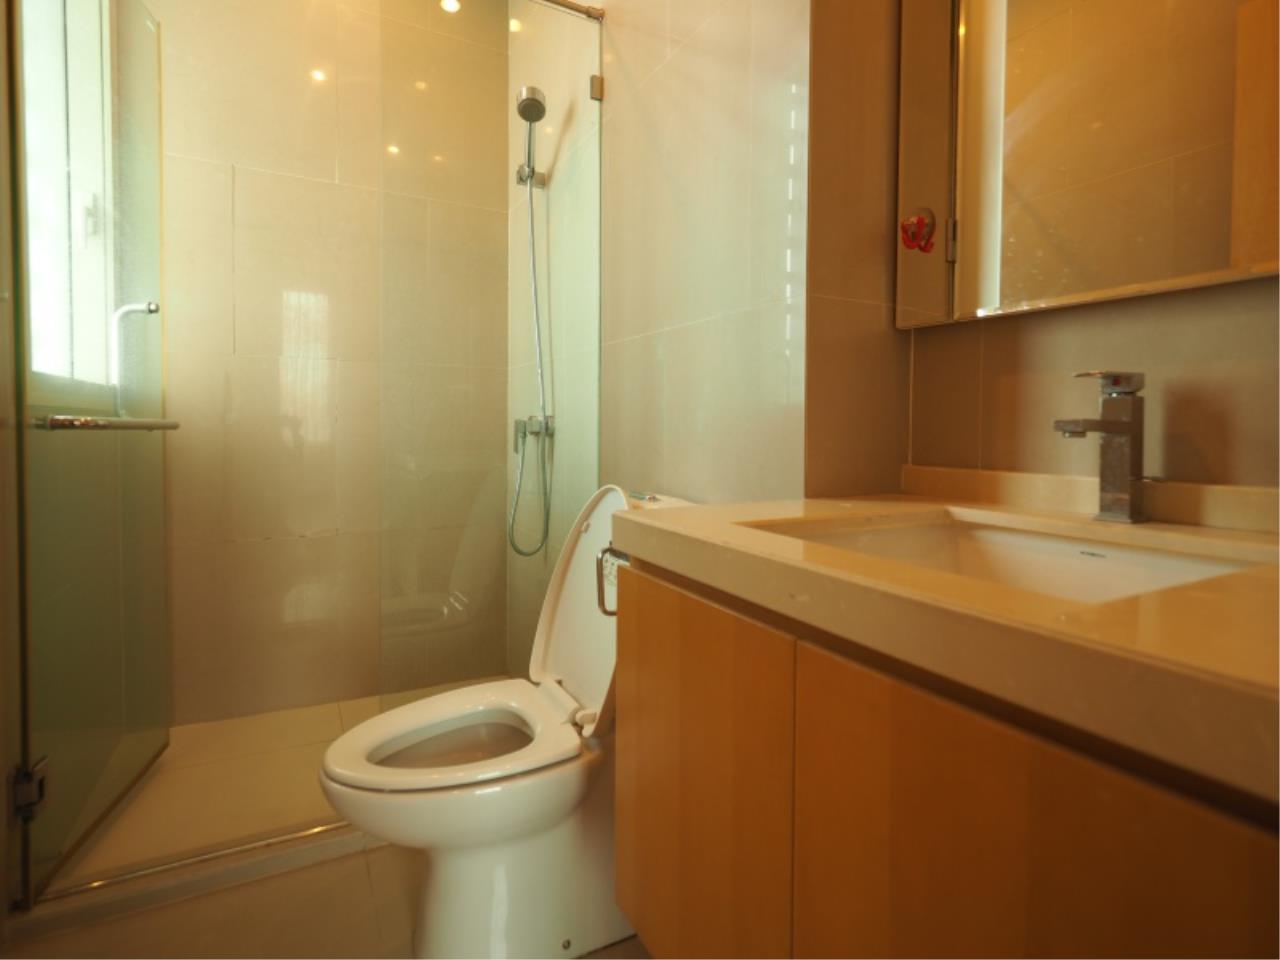 Century21 Skylux Agency's Wind Ratchayothin / Condo For Rent / 2 Bedroom / 79.39 SQM / MRT Lat Phrao / Bangkok 10